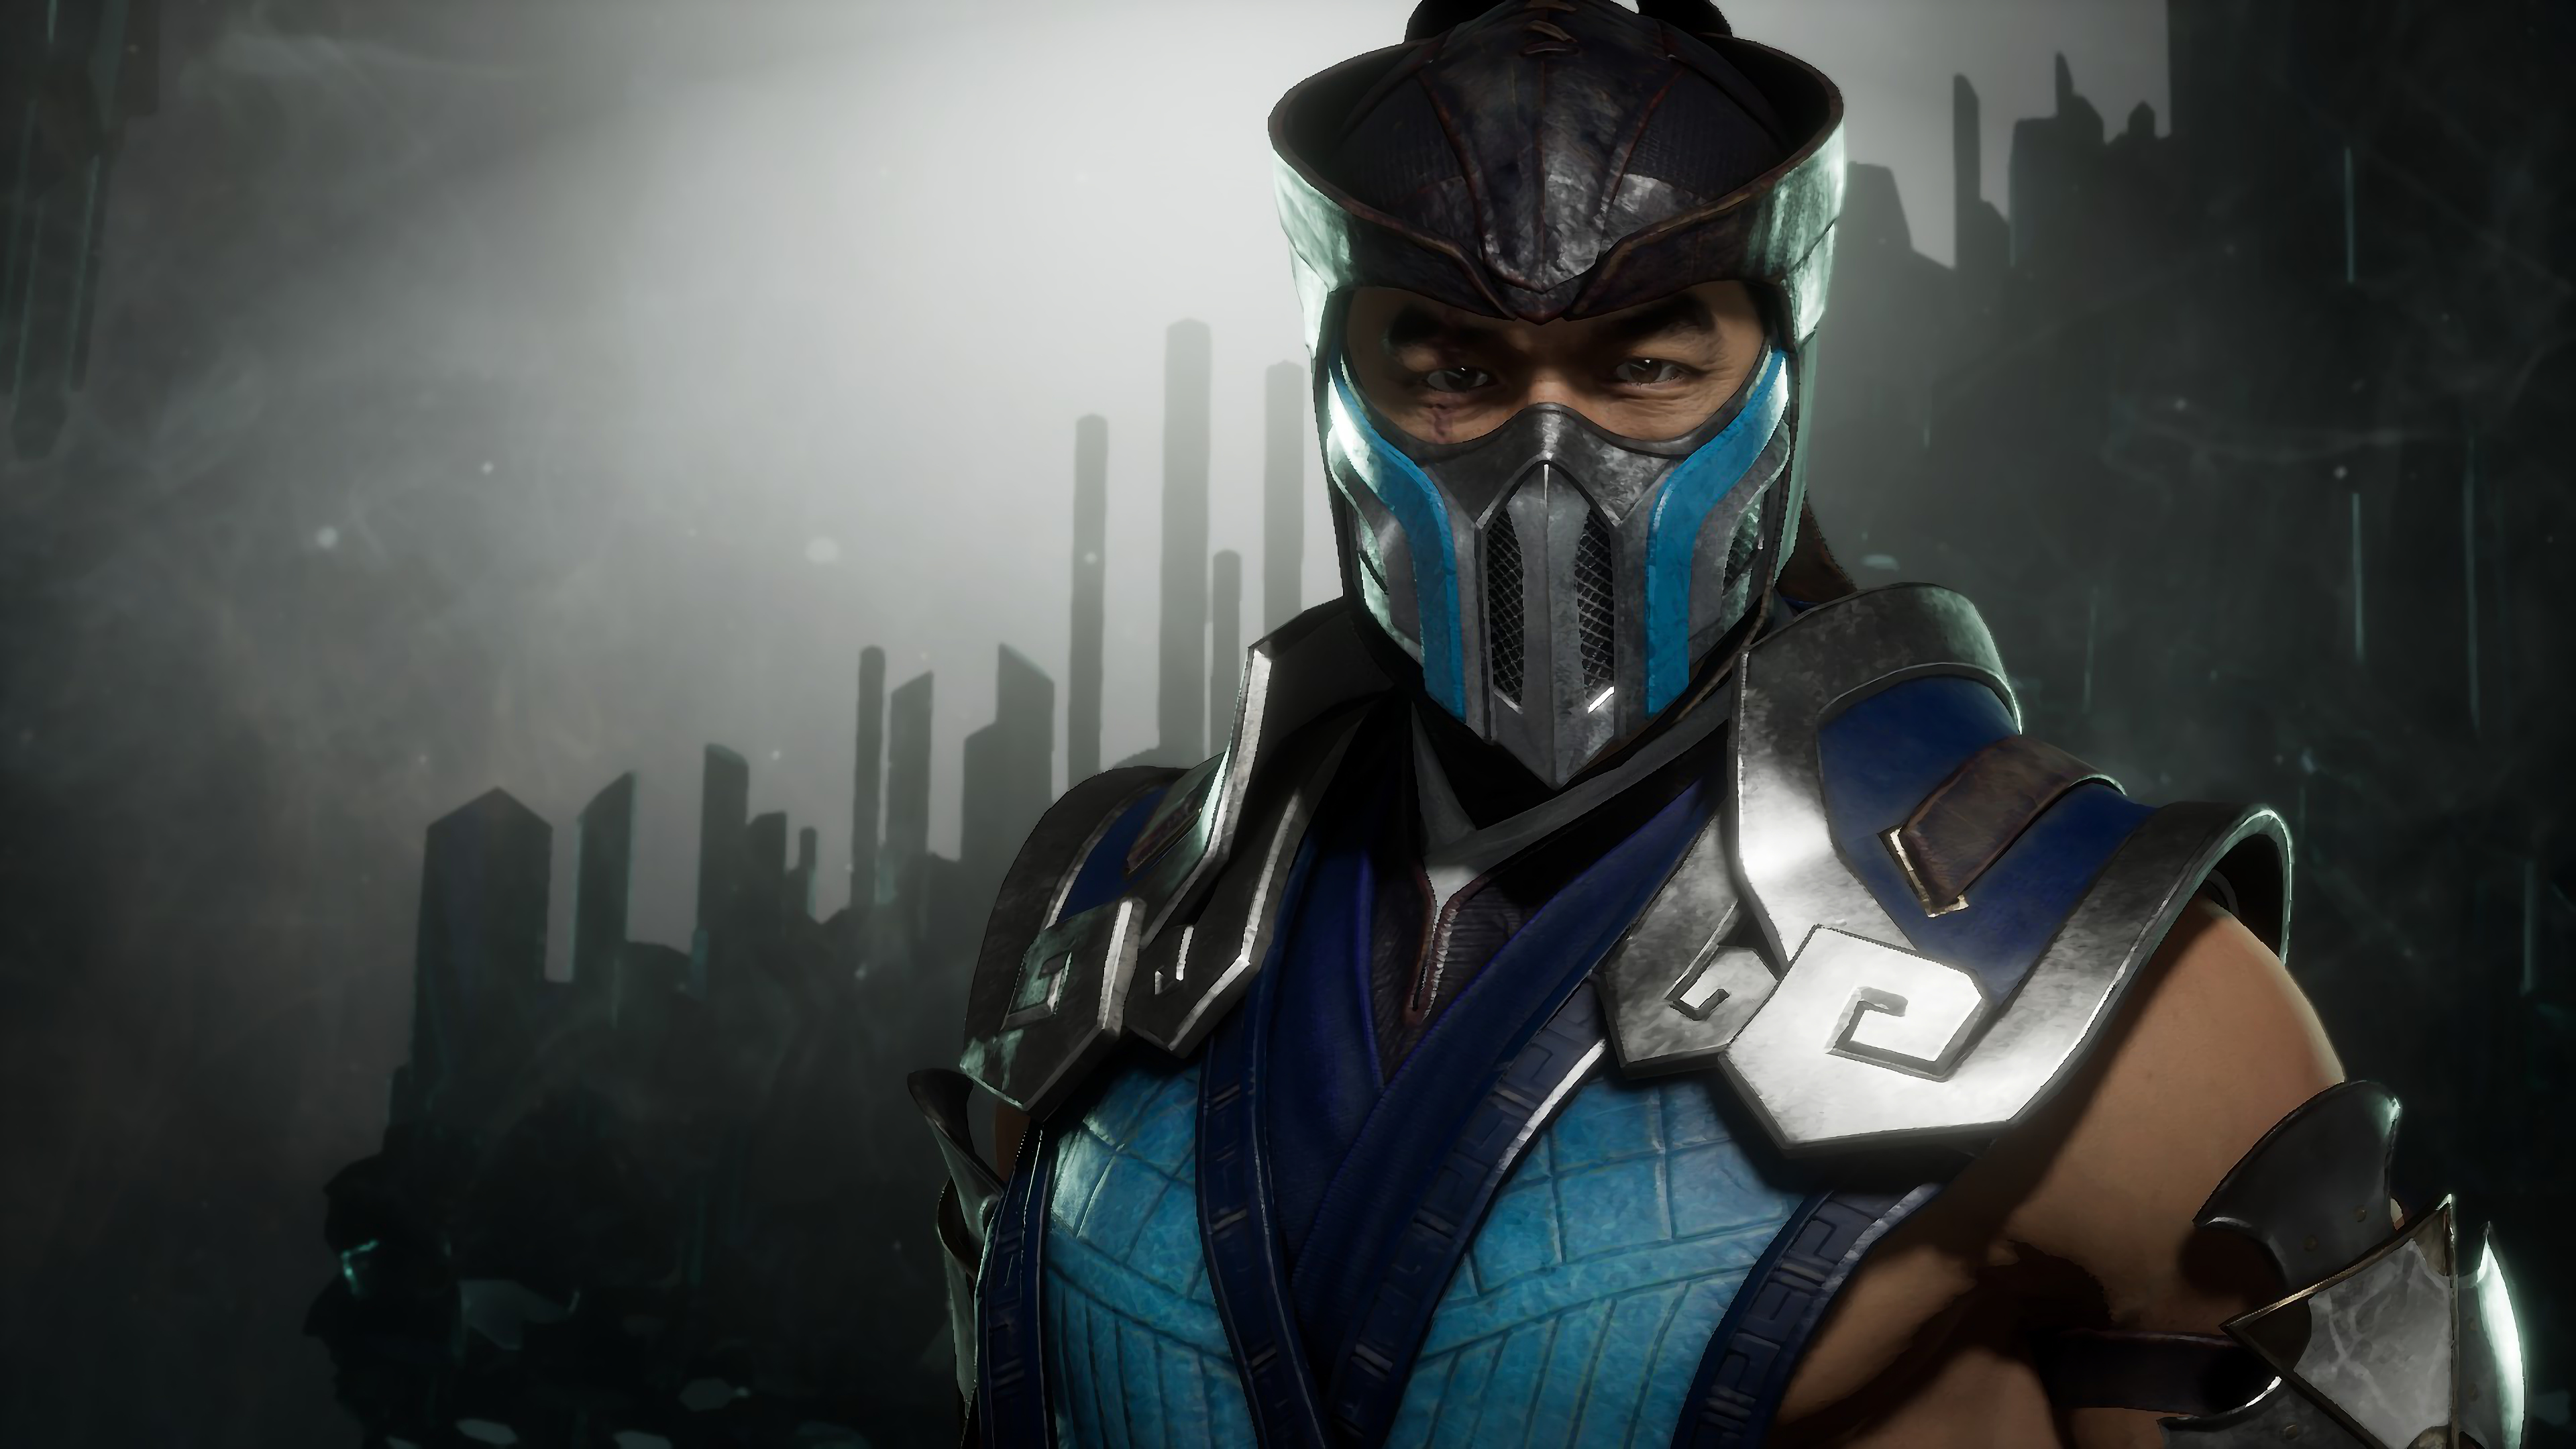 Sub Zero Mortal Kombat 11 4k Kano Mortal Kombat 11 2529749